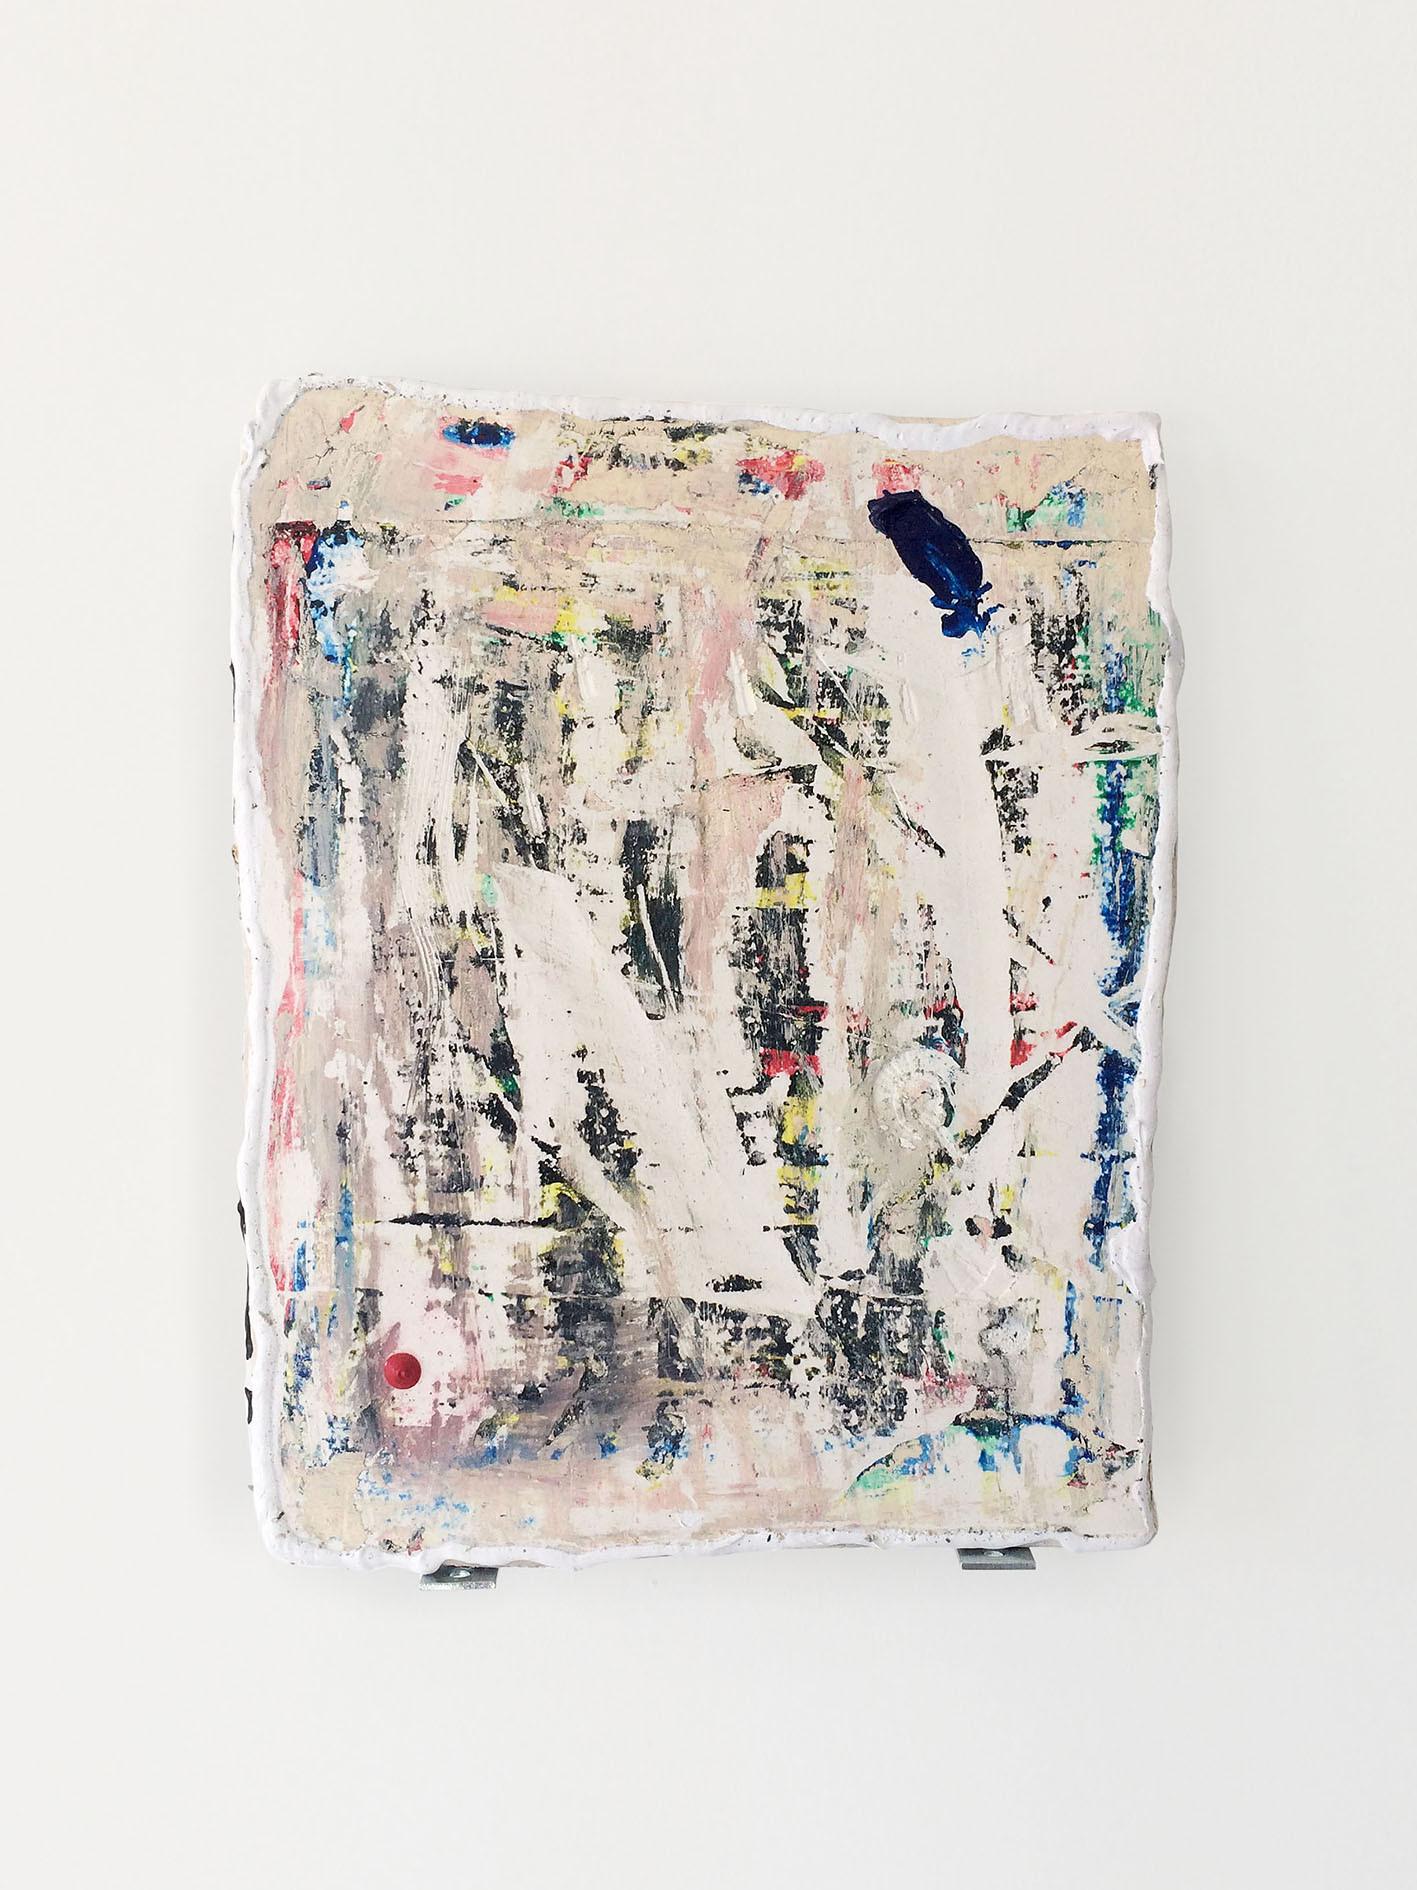 Al borde, 2017. Acrylic and plaster. 35 x 25 cm.